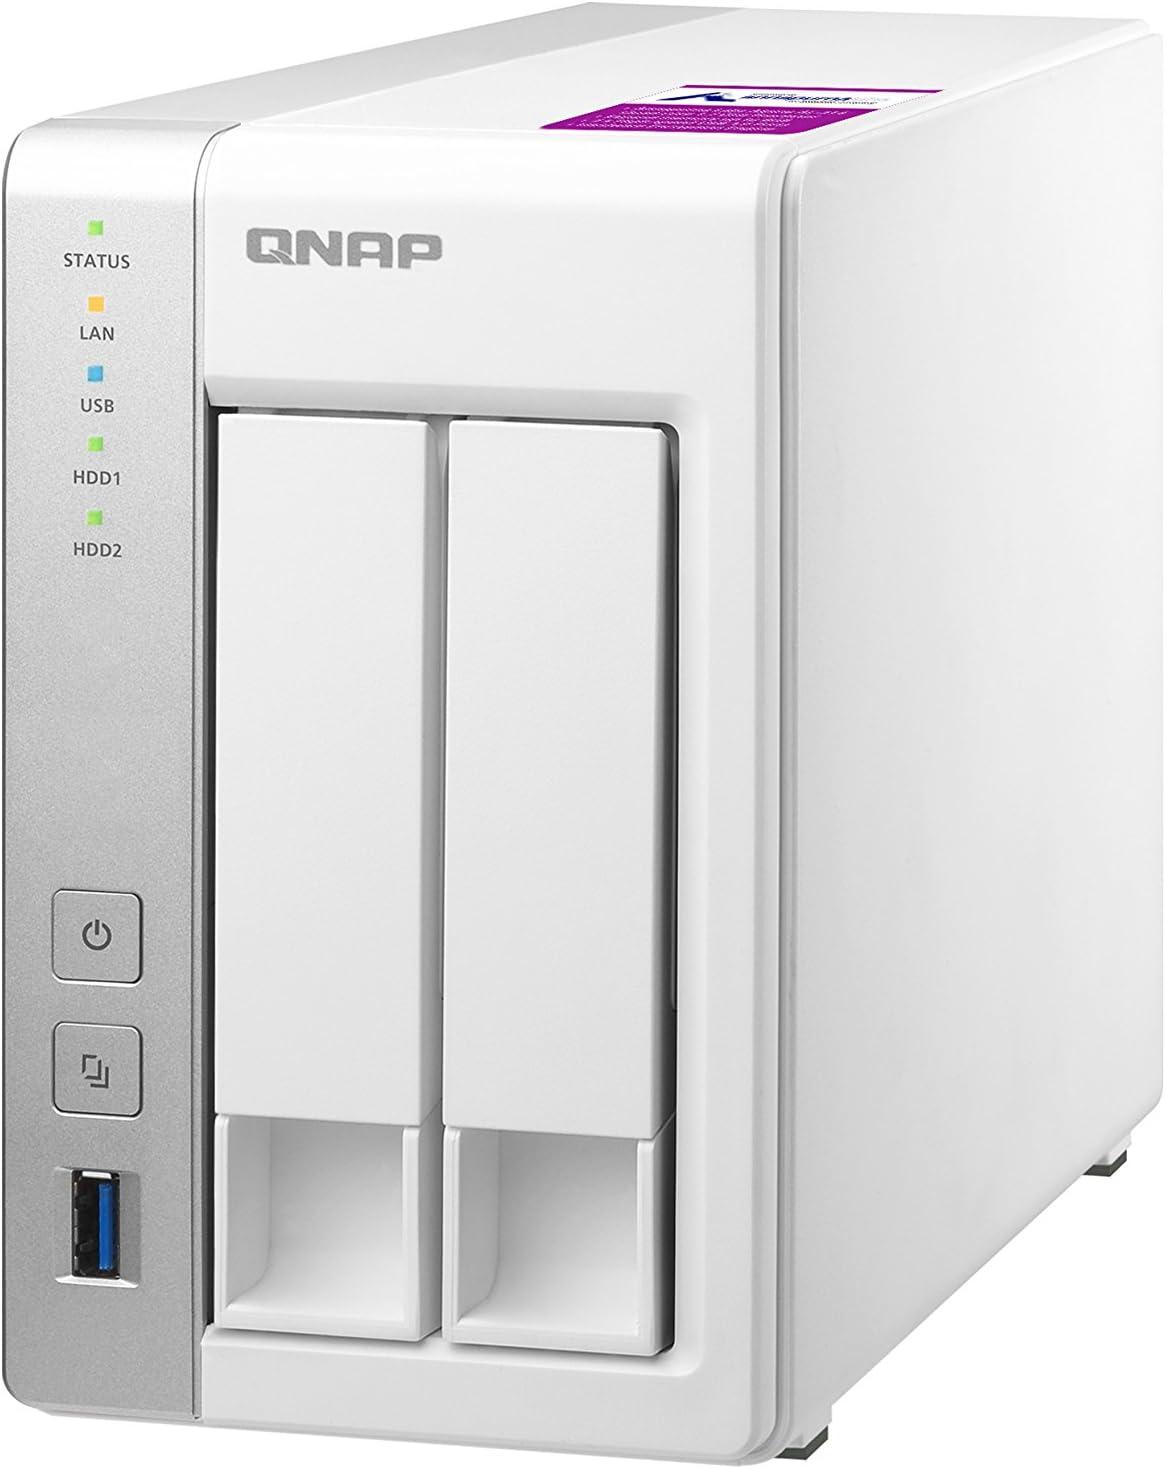 QNAP TS-231P2 Ethernet Torre Gris, Blanco NAS - Unidad Raid (8 TB, Unidad de Disco Duro, Unidad de Disco Duro, SSD, Serial ATA III, 4000 GB, 3.5